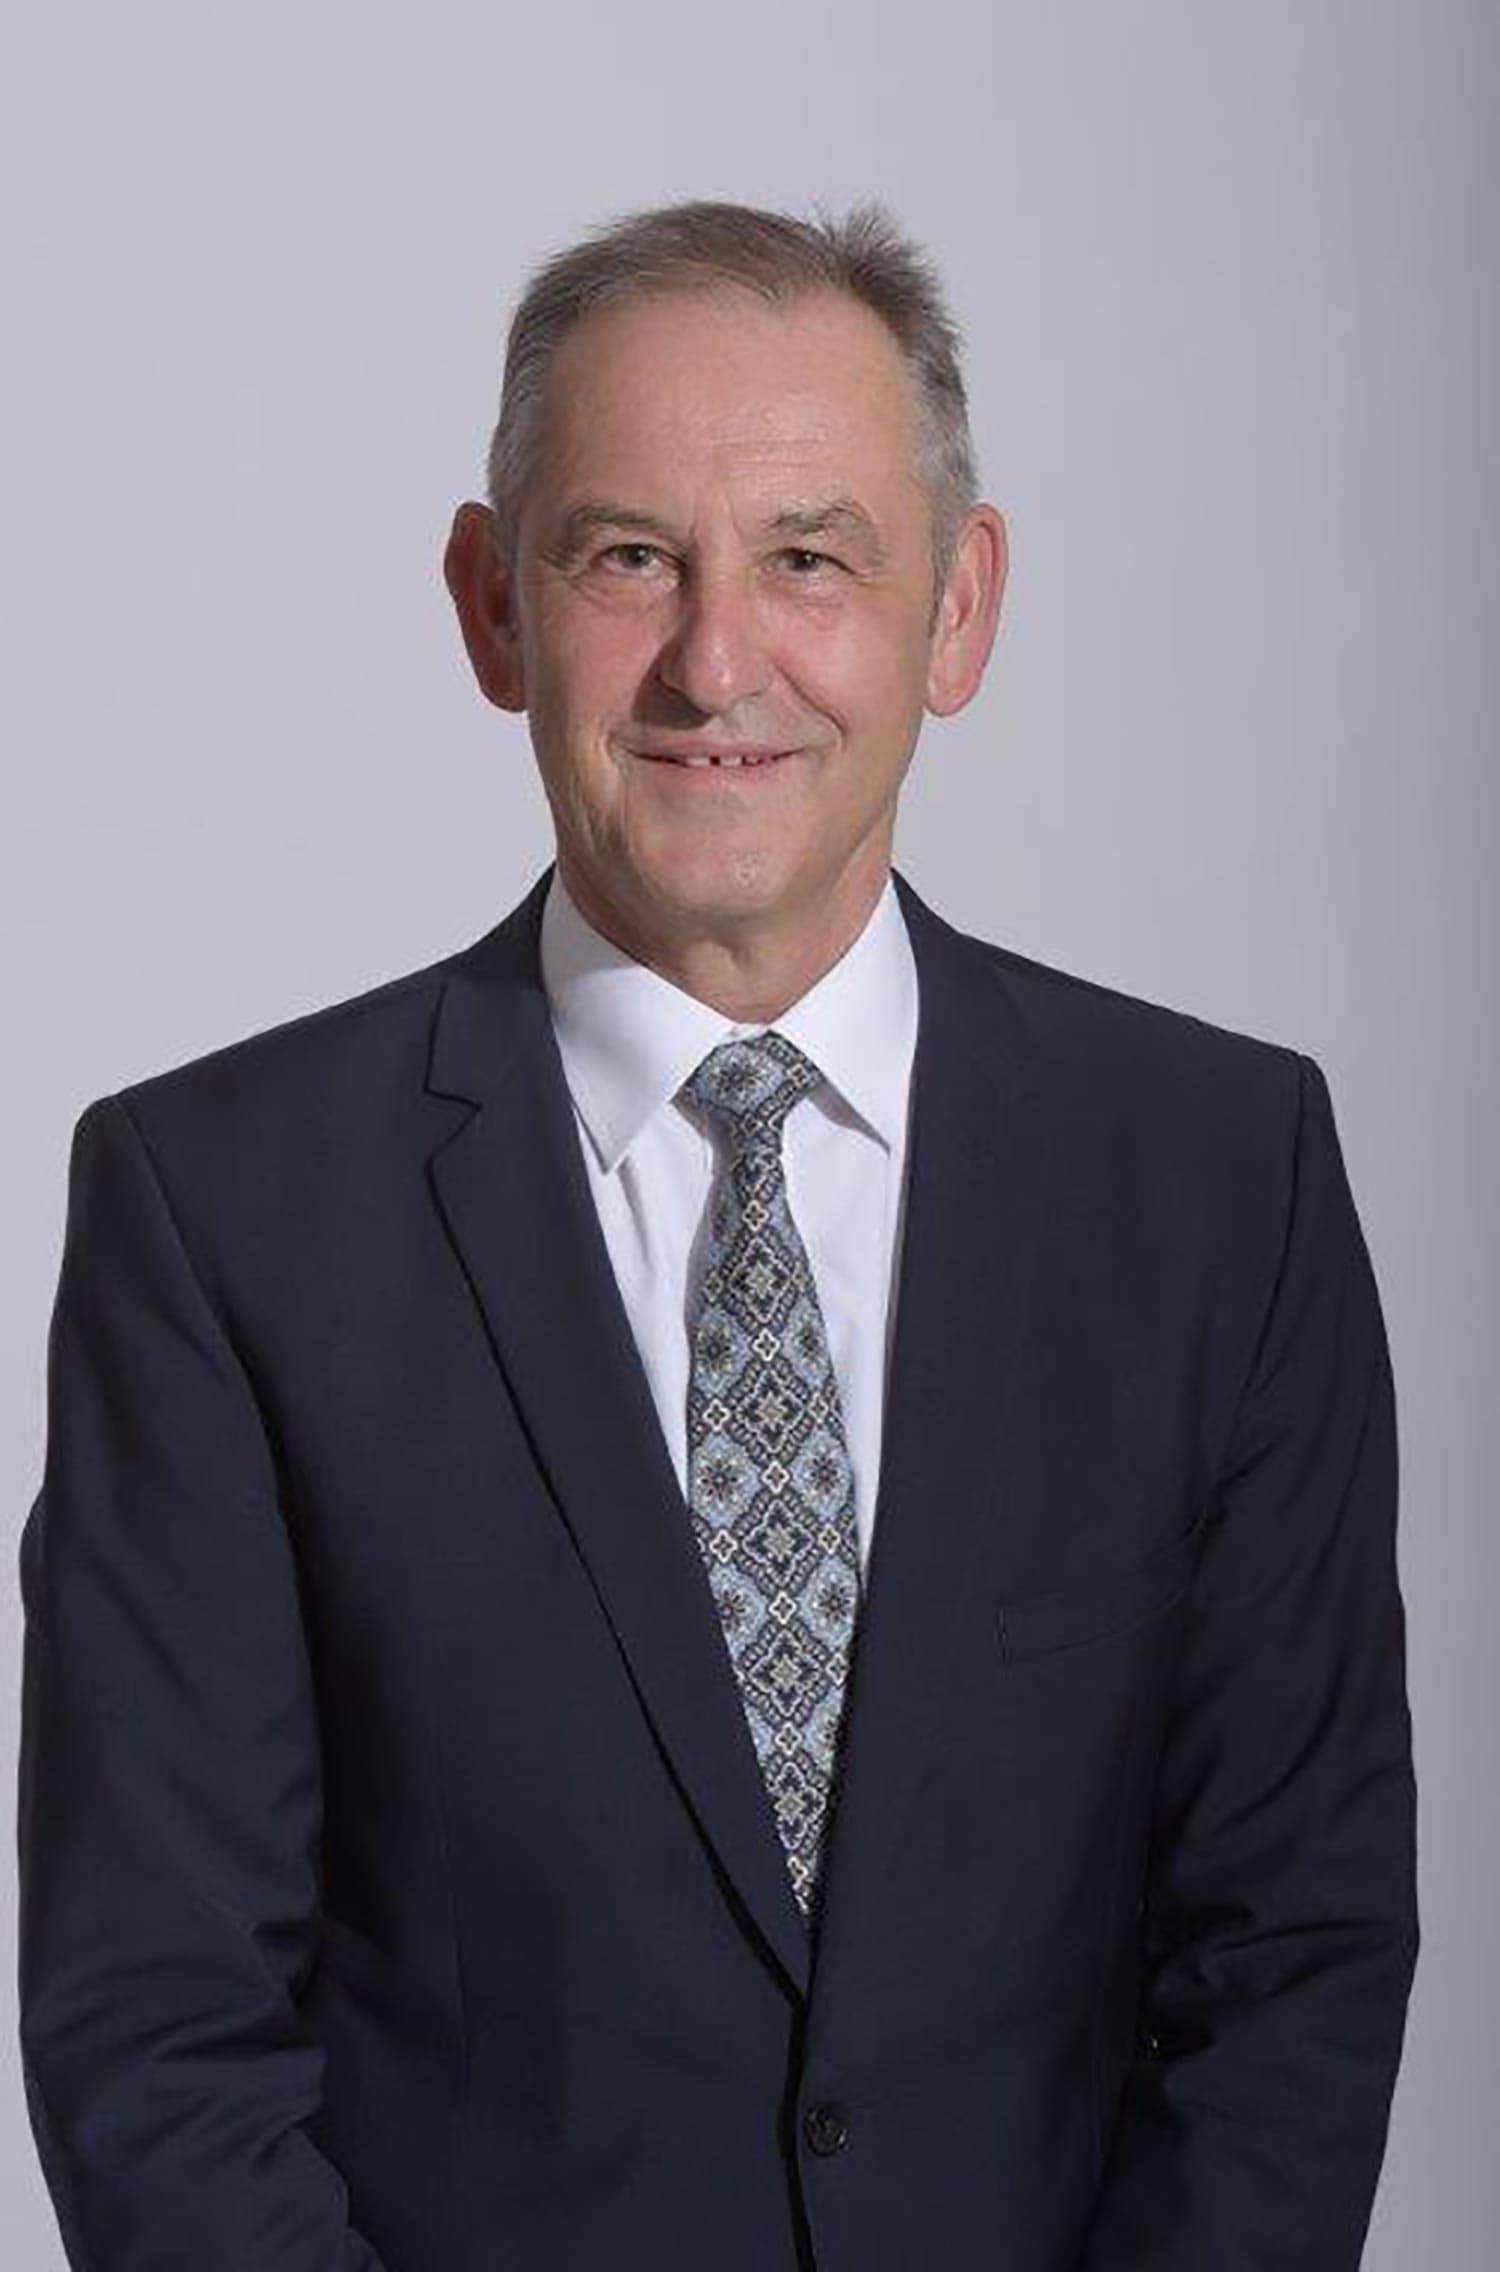 Freie Wähler - Ludwig Artinger (63) Direktor des Amtsgerichts Foto: Freie Wähler